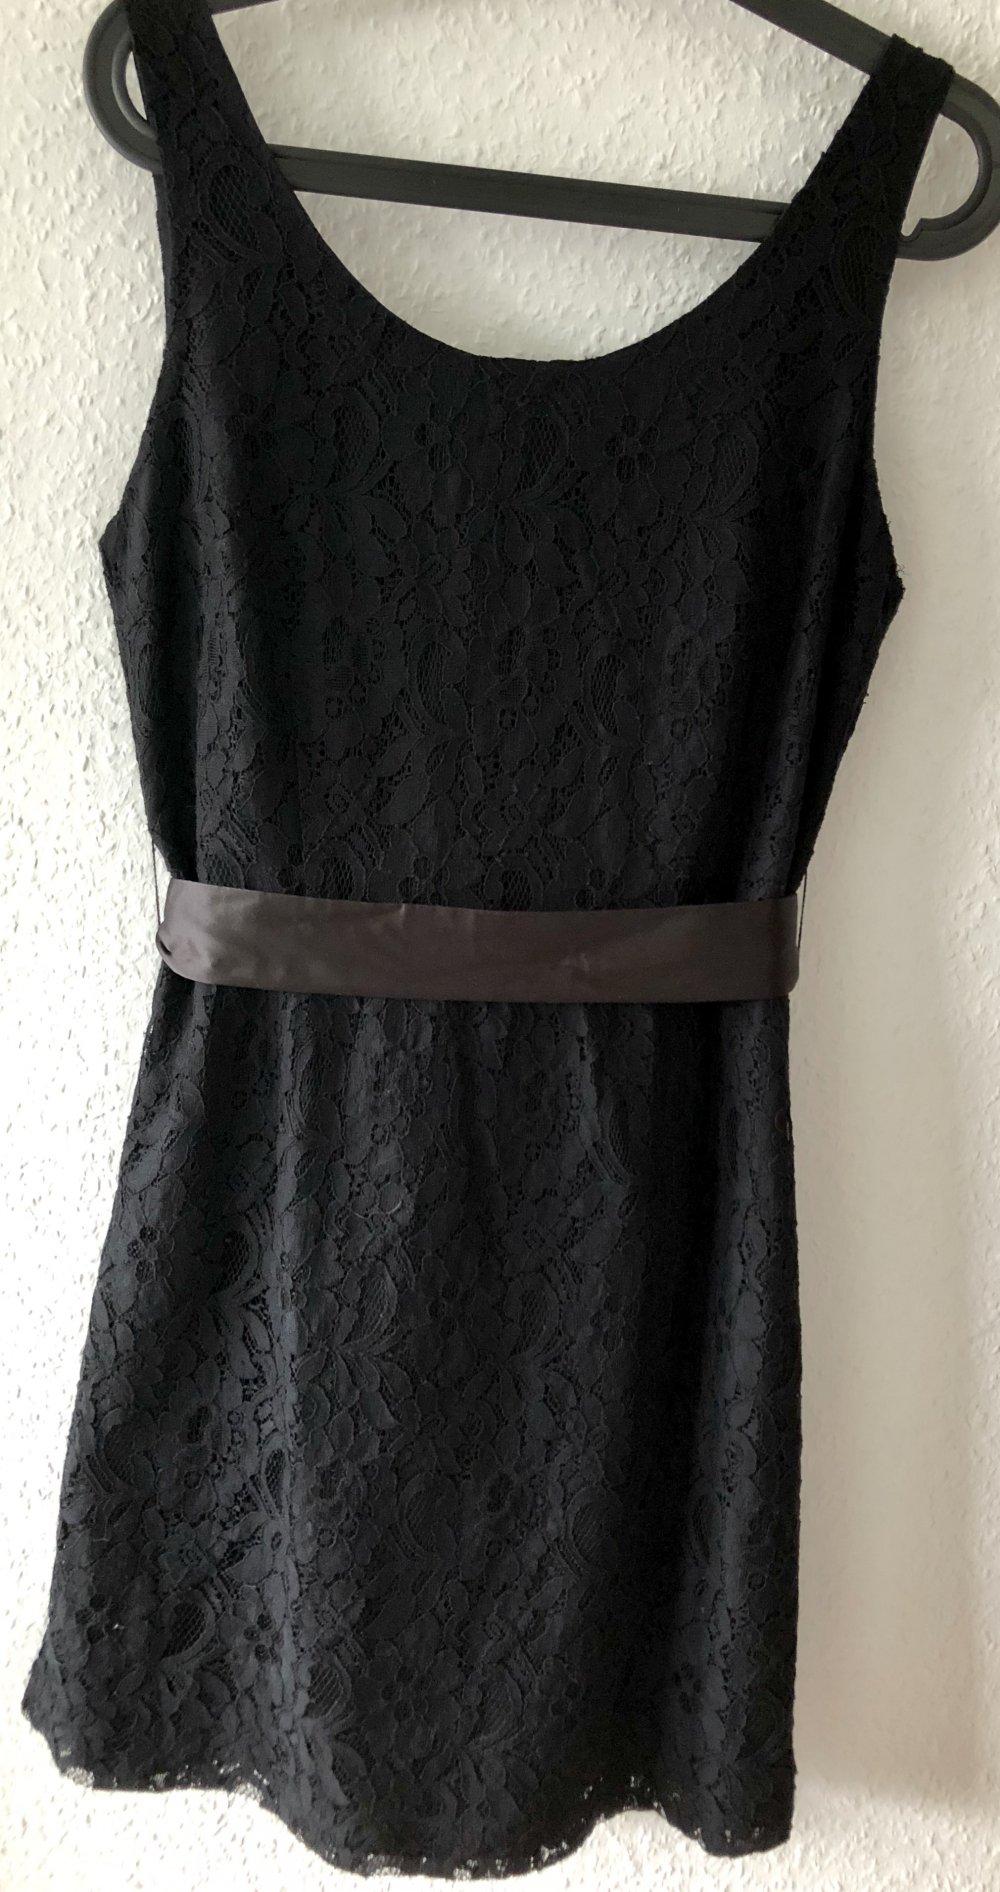 süßes Spitzenkleid von Tom Tailor Denim    Kleiderkorb.de 18dfdf838e